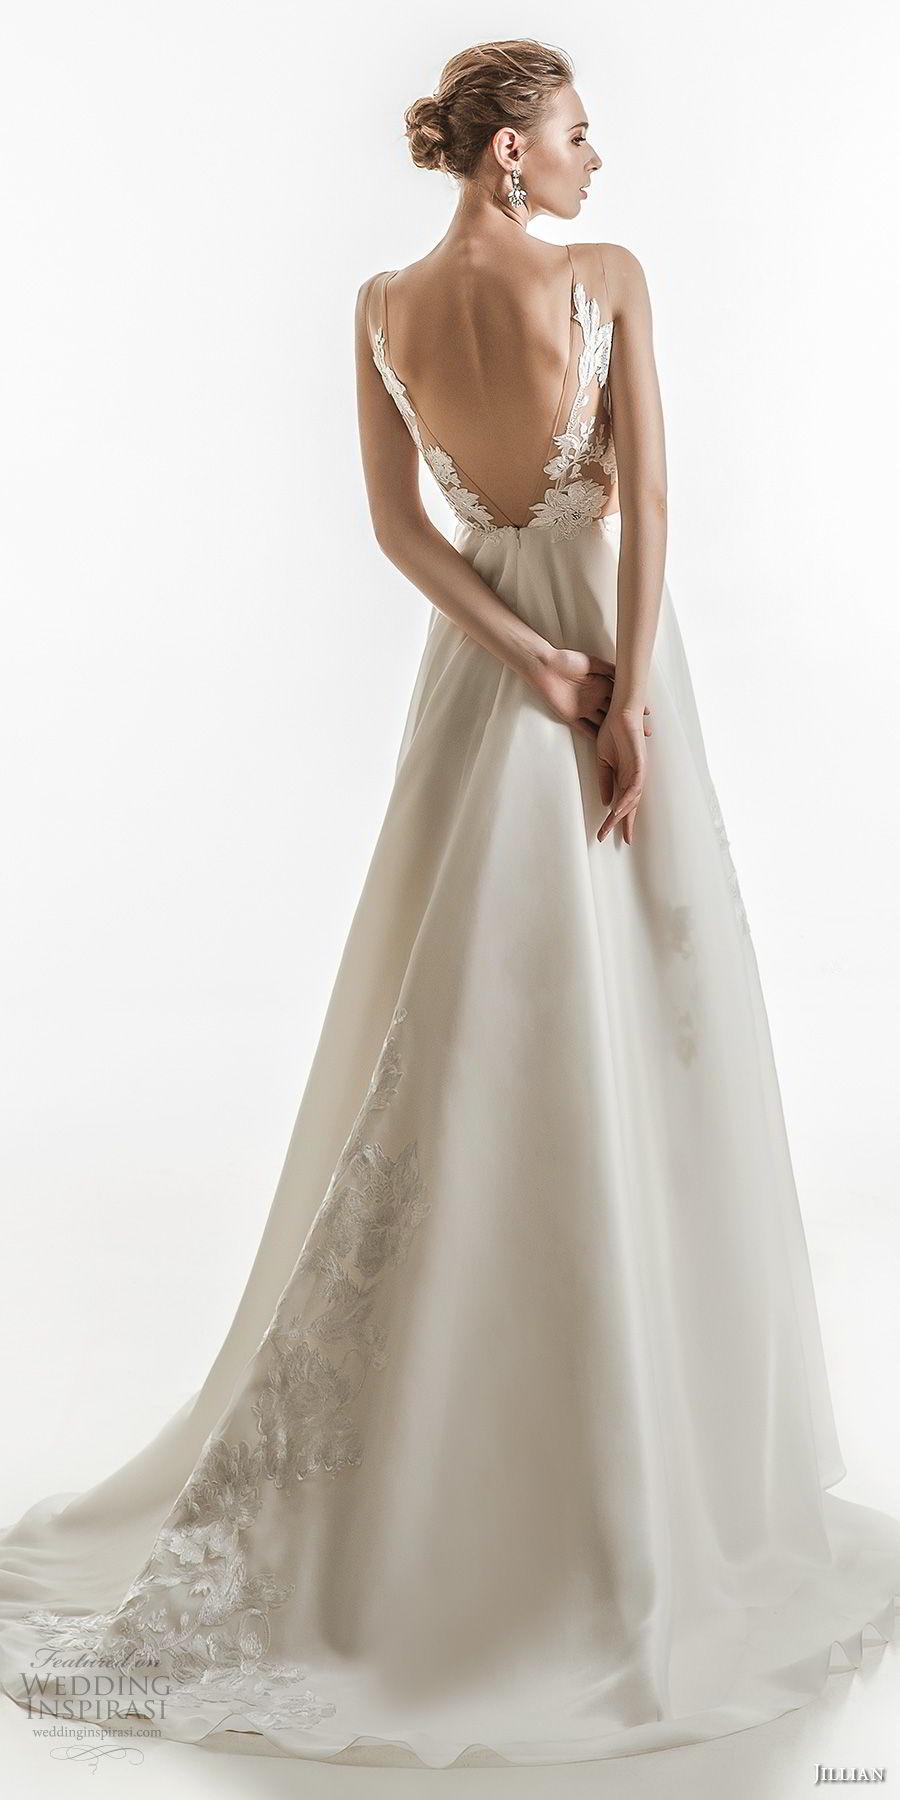 jillian 2018 bridal sleeveless v neck heavily embellished bodice elegant a  line wedding dress open v back medium train (14) bv